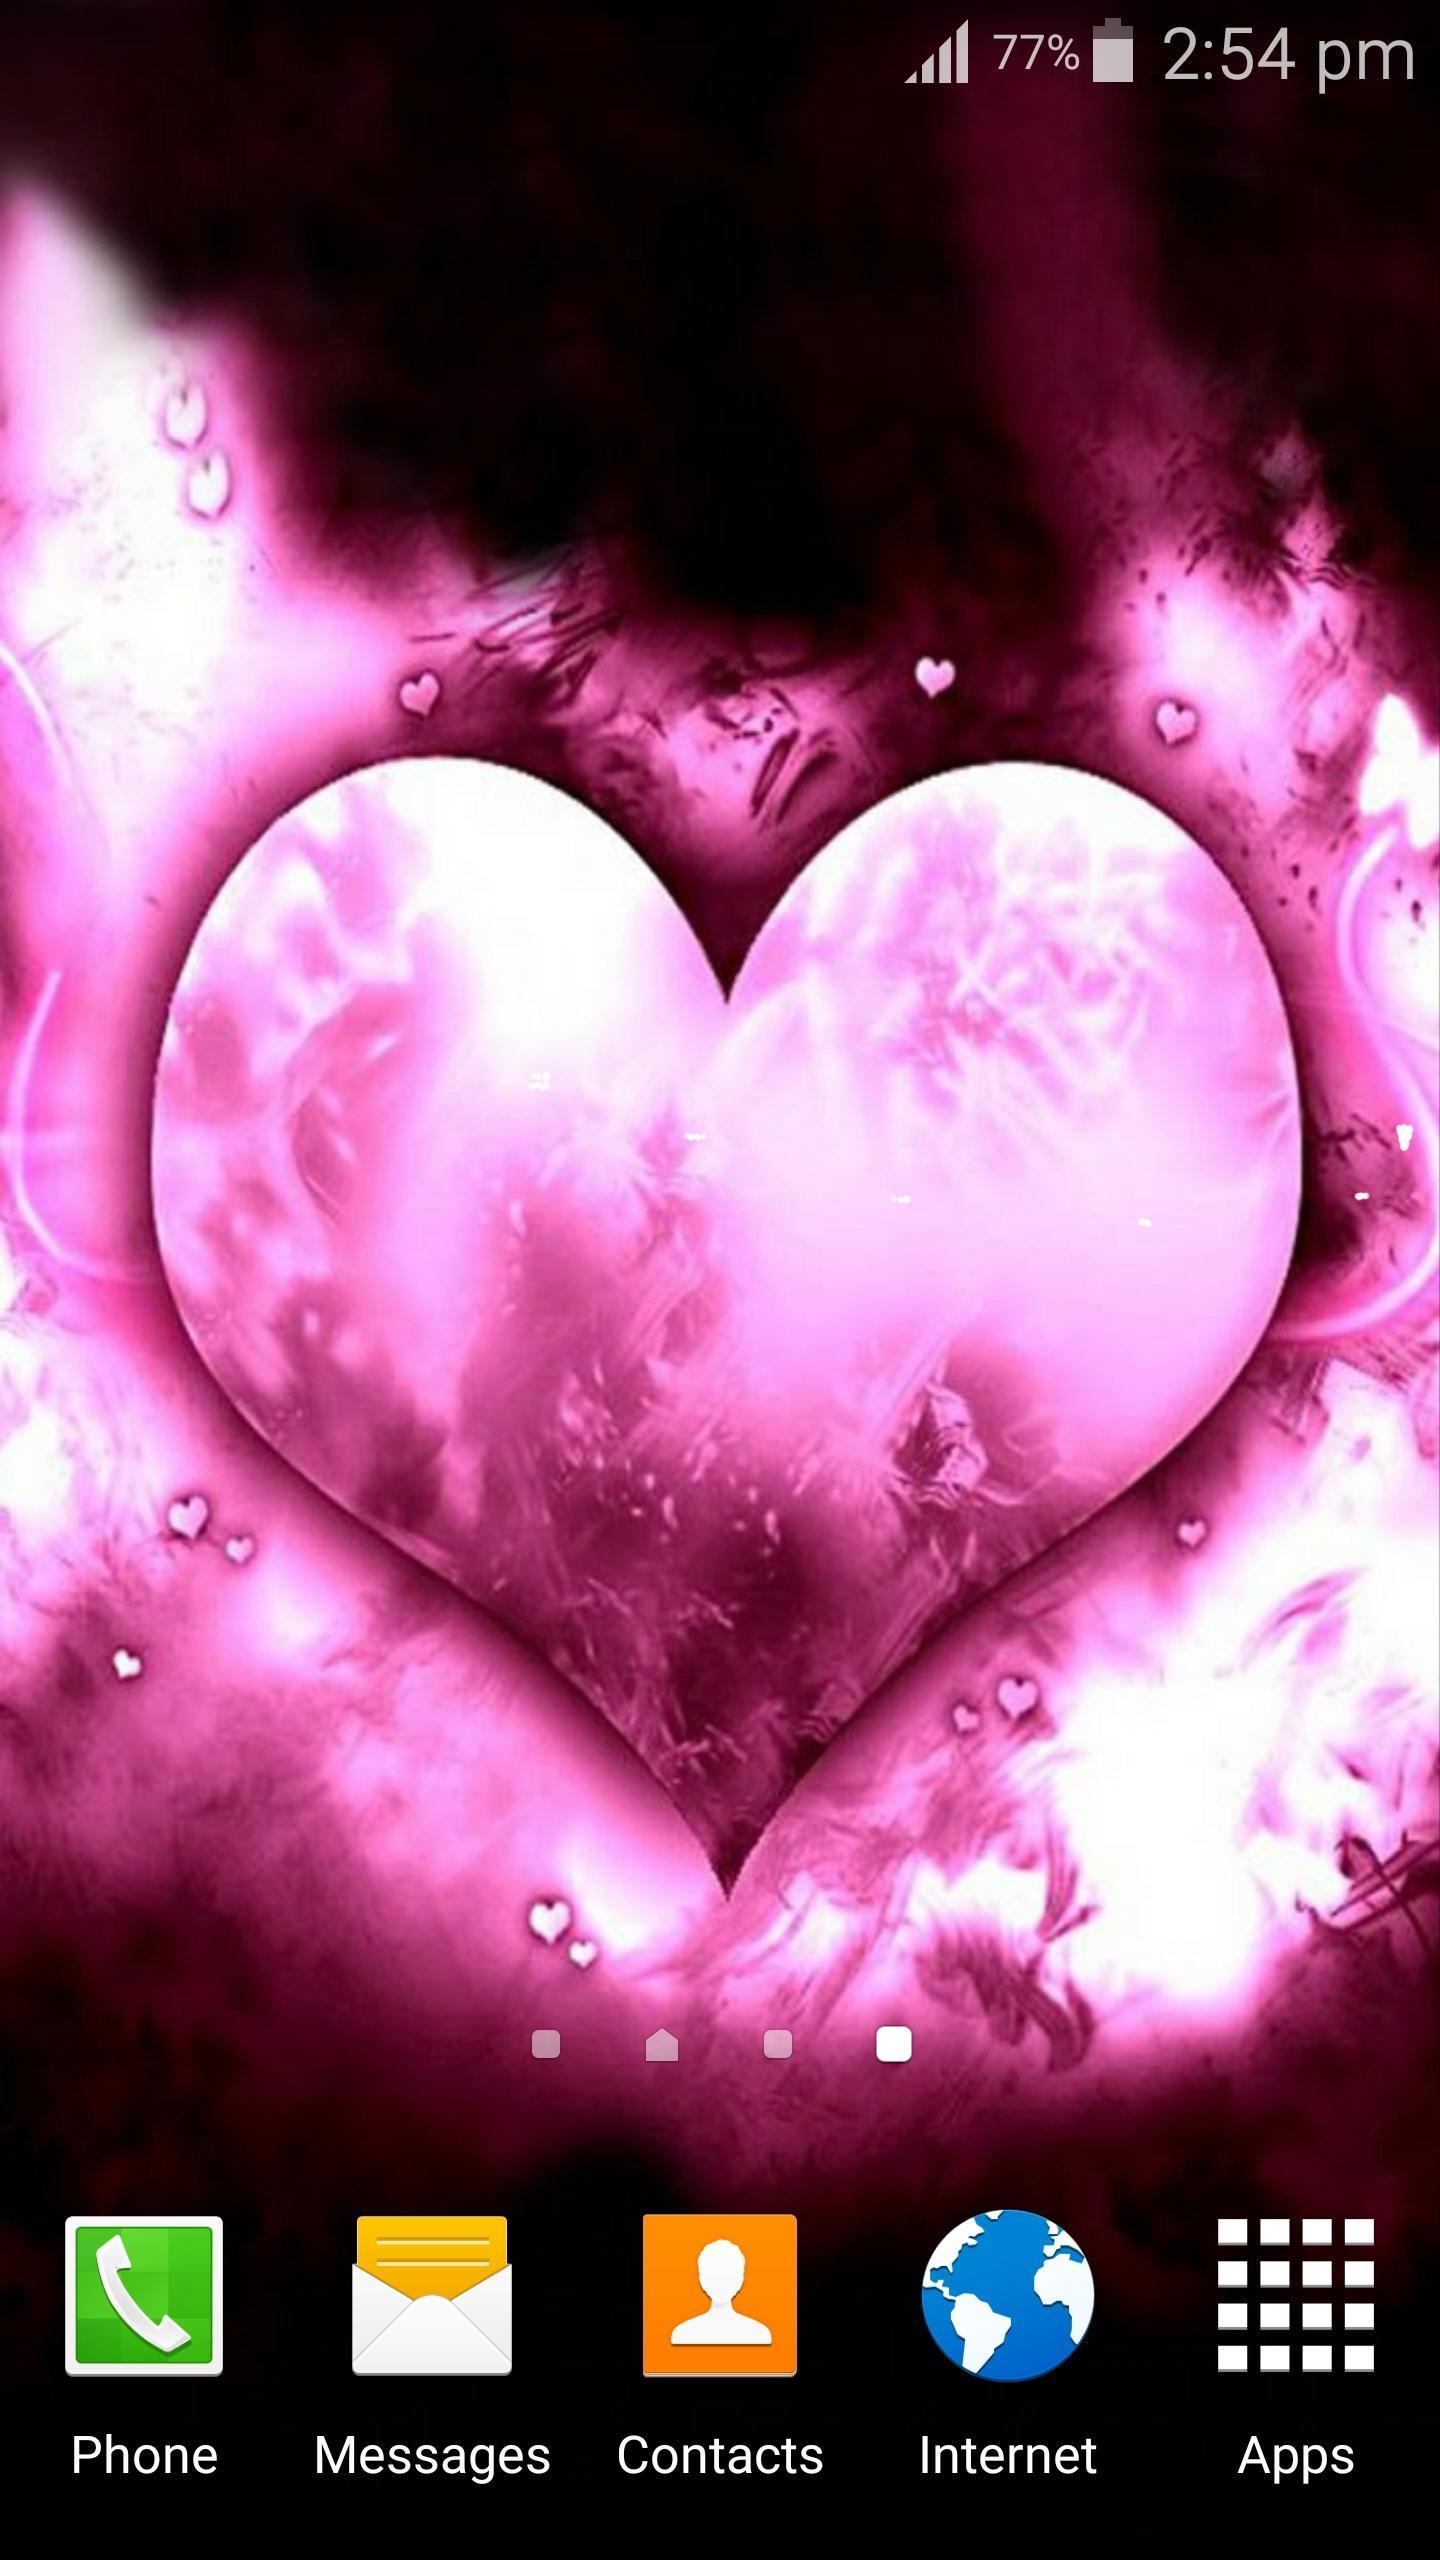 9000 Koleksi Romantic Love Live Wallpaper Free Download For Android HD